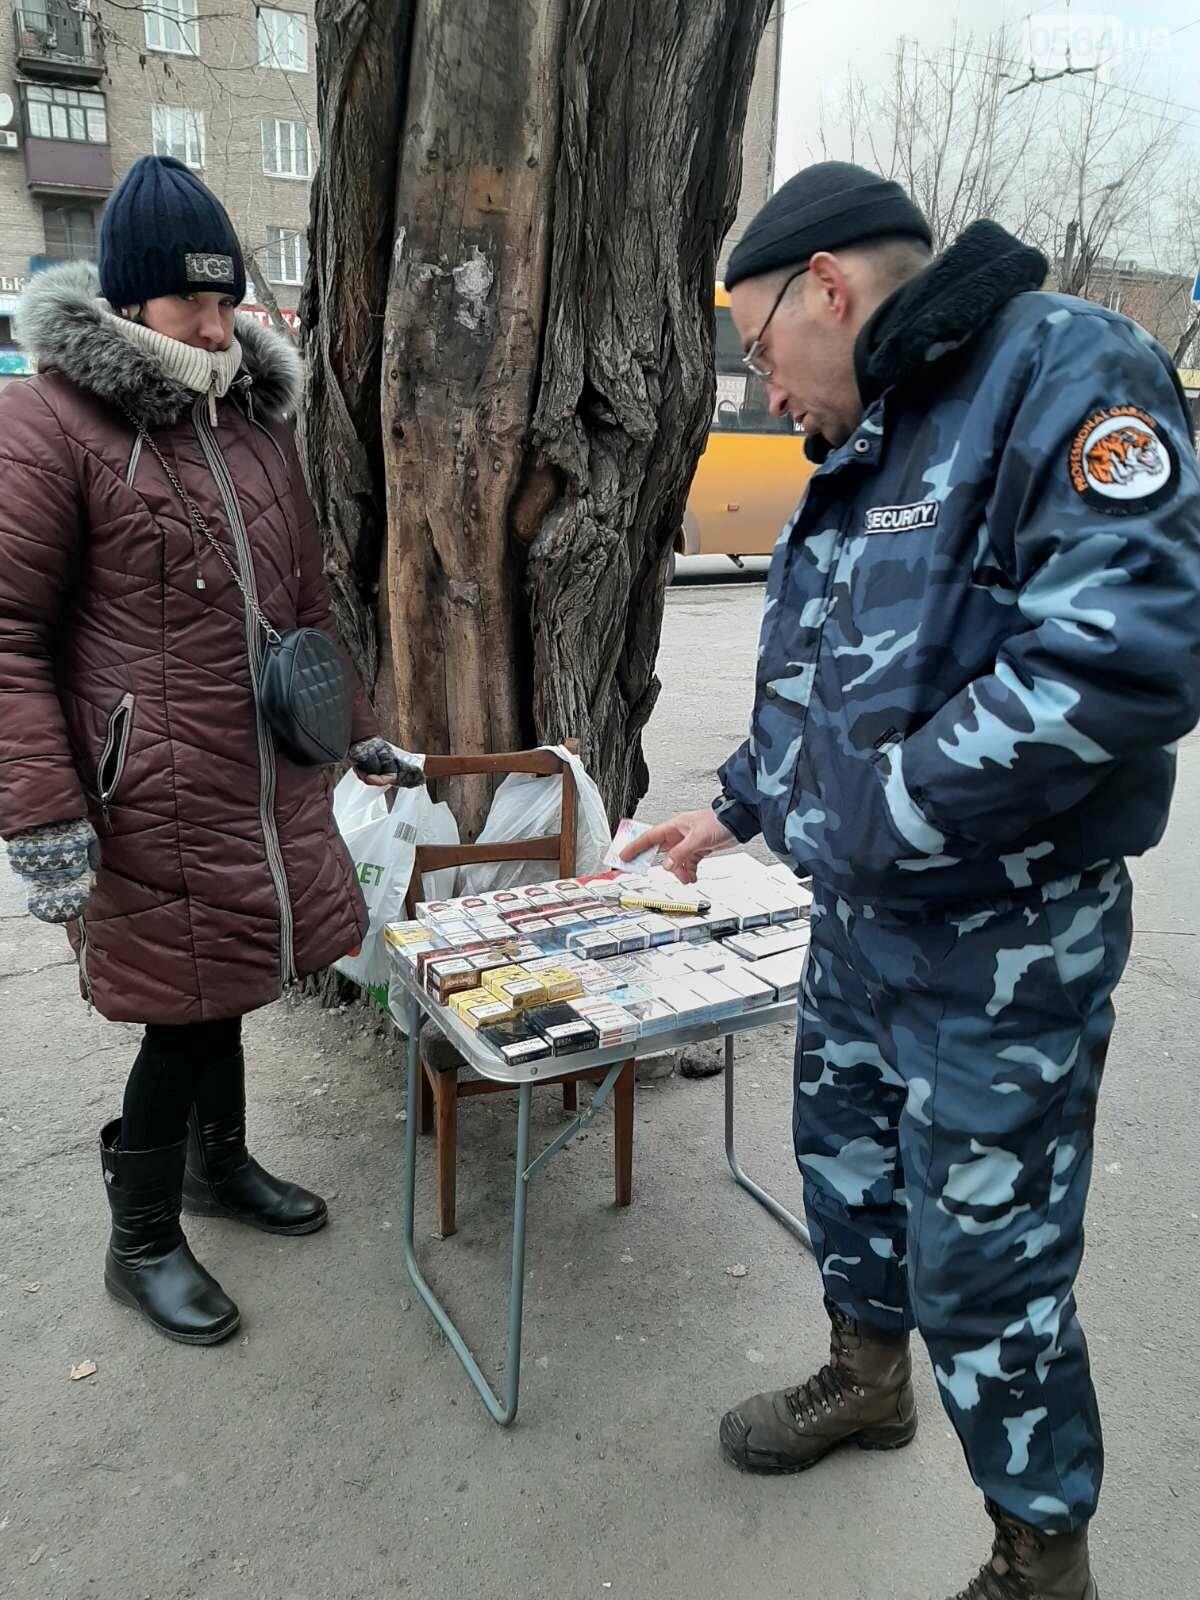 В Кривом Роге изъяли почти 500 пачек сигарет без акцизных марок, - ФОТО , фото-6